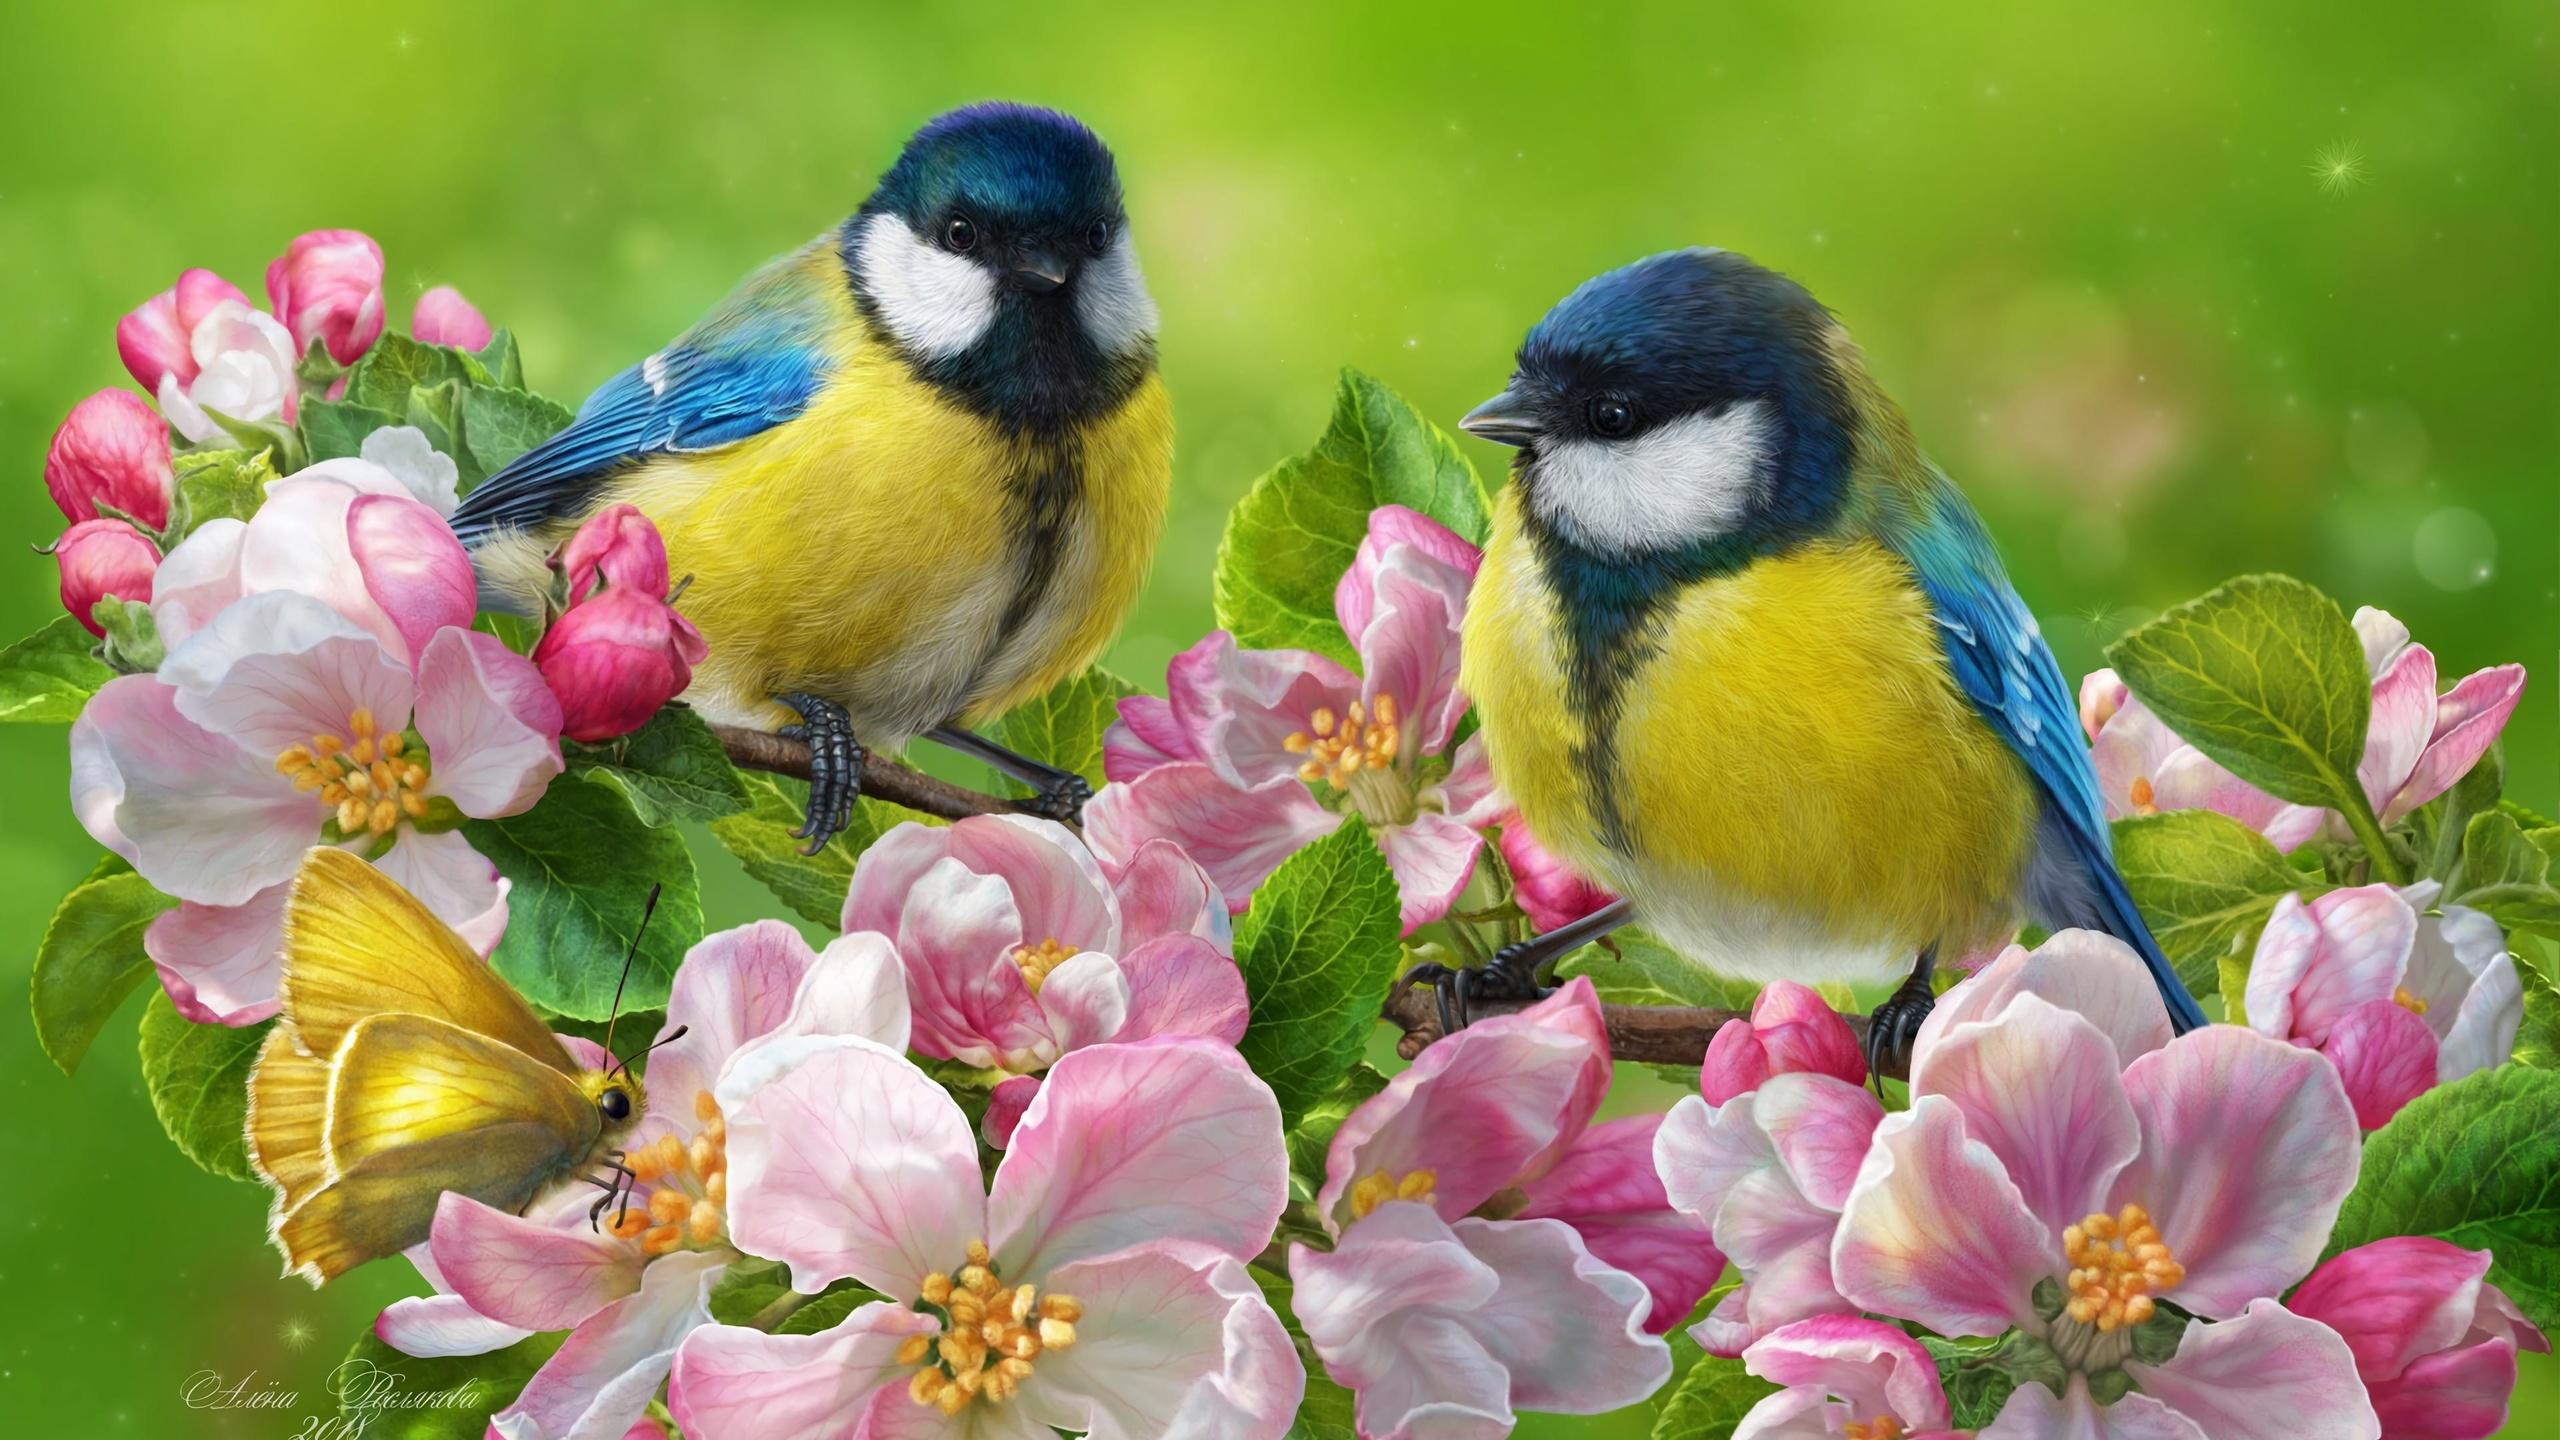 синица, птица, цветы, яркие, арт